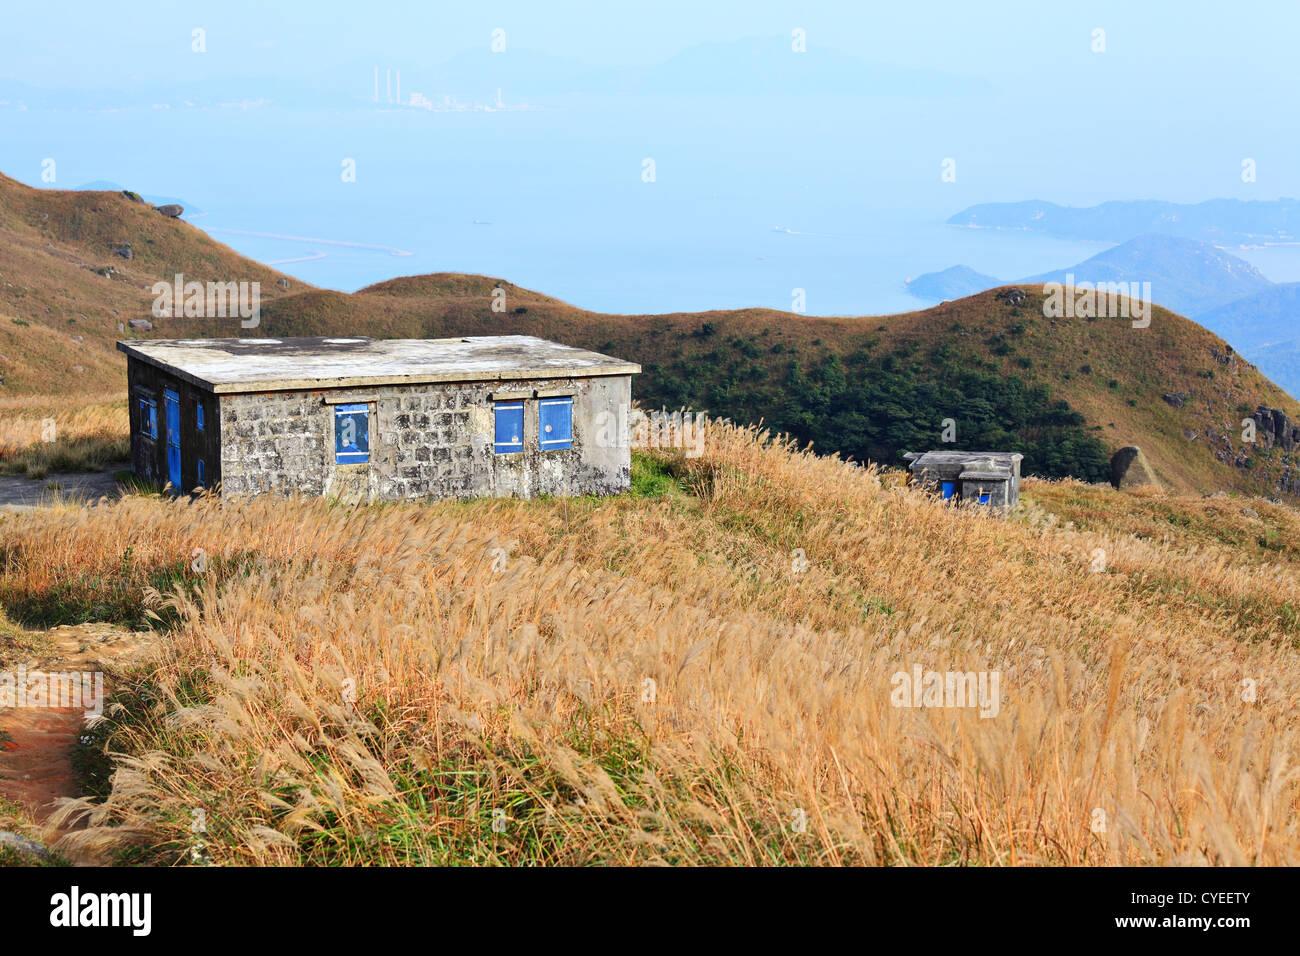 house on mountain - Stock Image